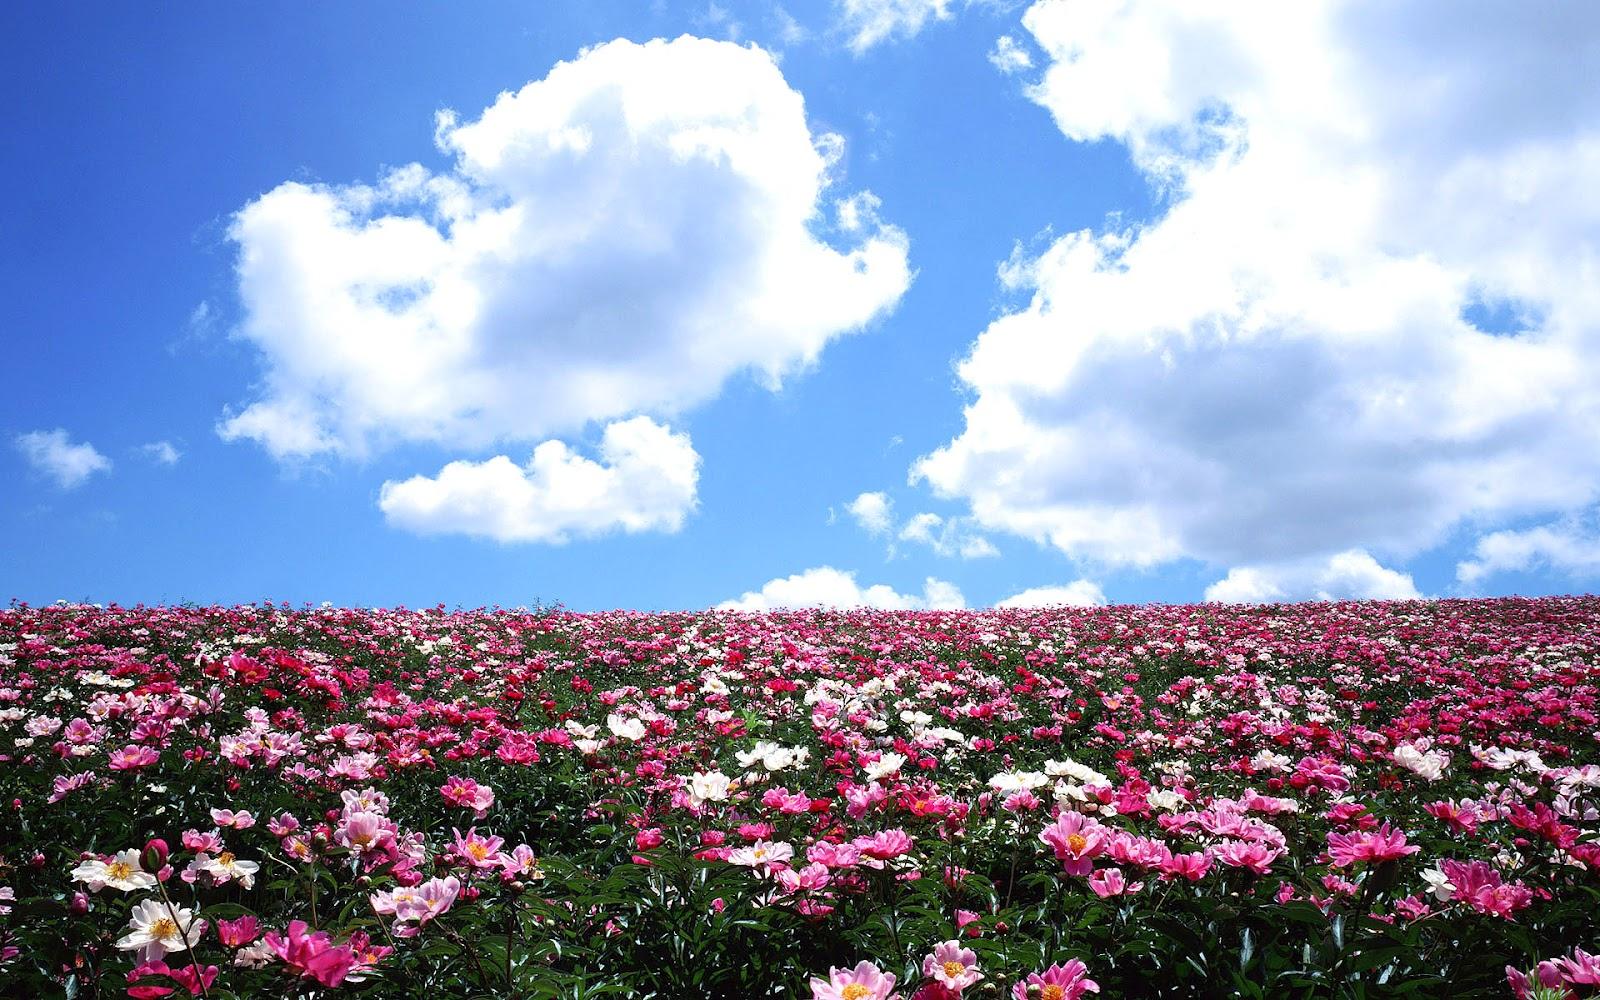 Flowers Wallpapers Flower Wallpaper ~ Top Best HD Wallpapers for Desktop